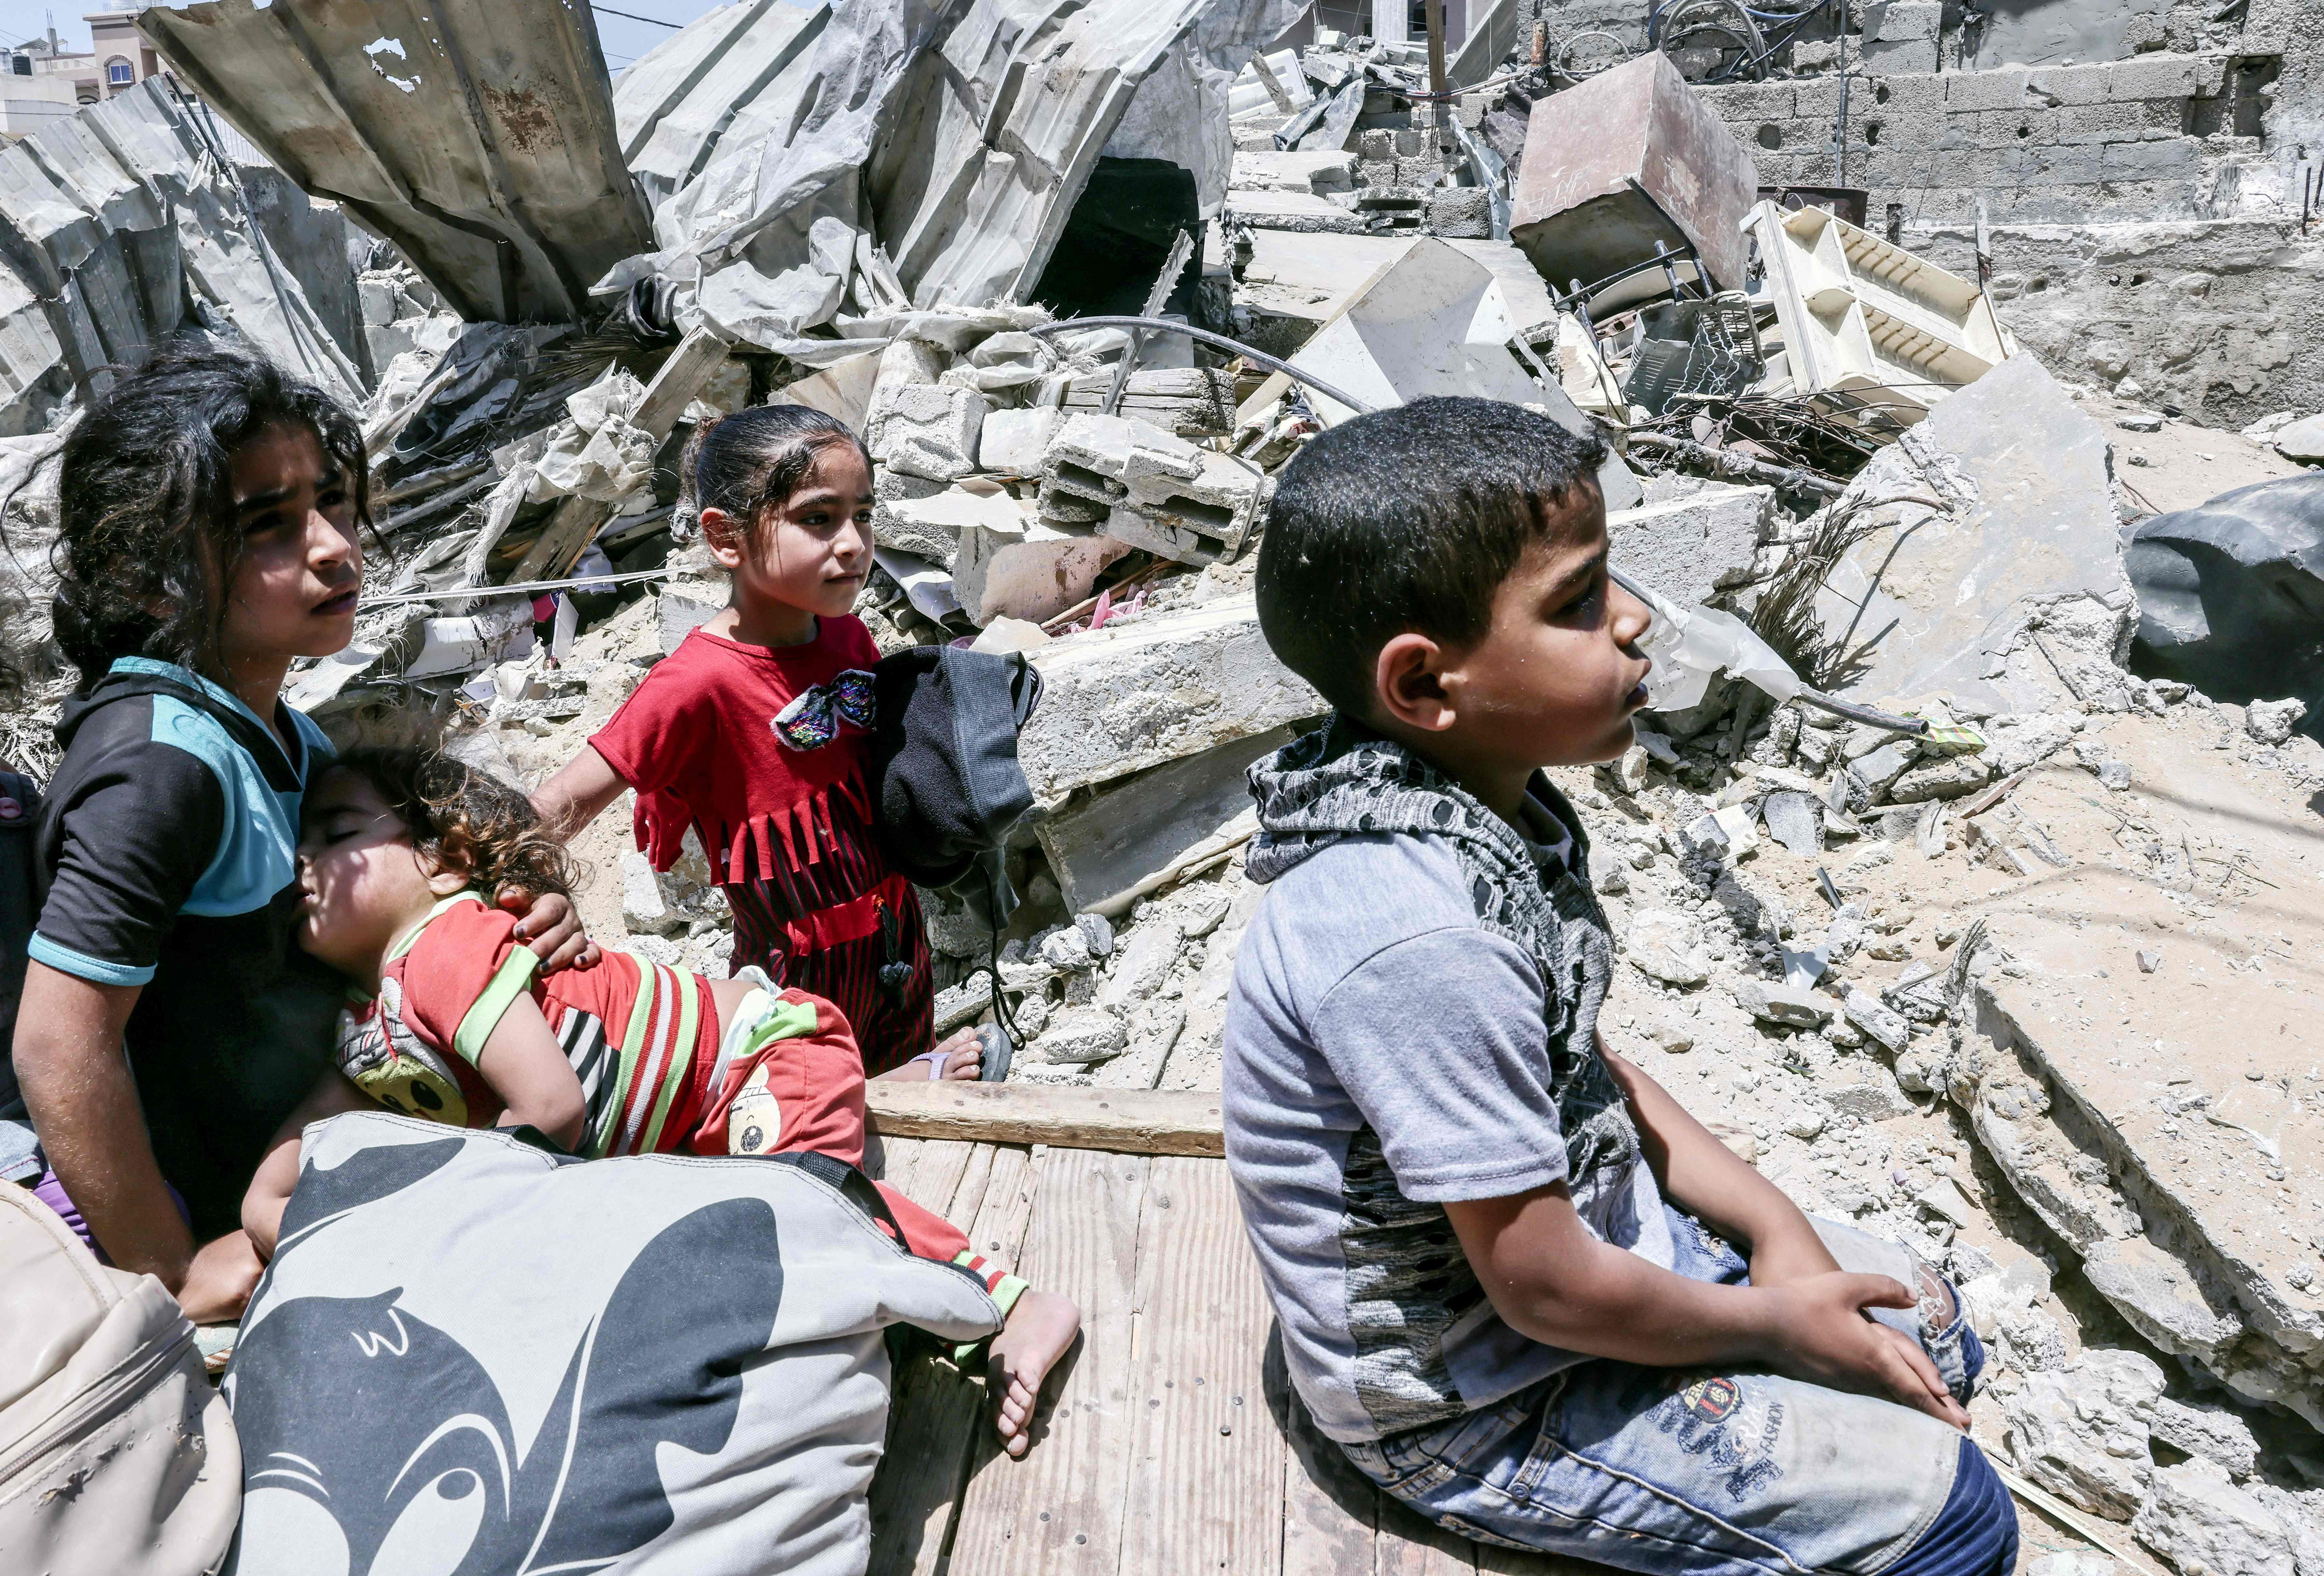 U.N. Secretary General requires immediate Gaza ceasefire as civilian death toll increases thumbnail